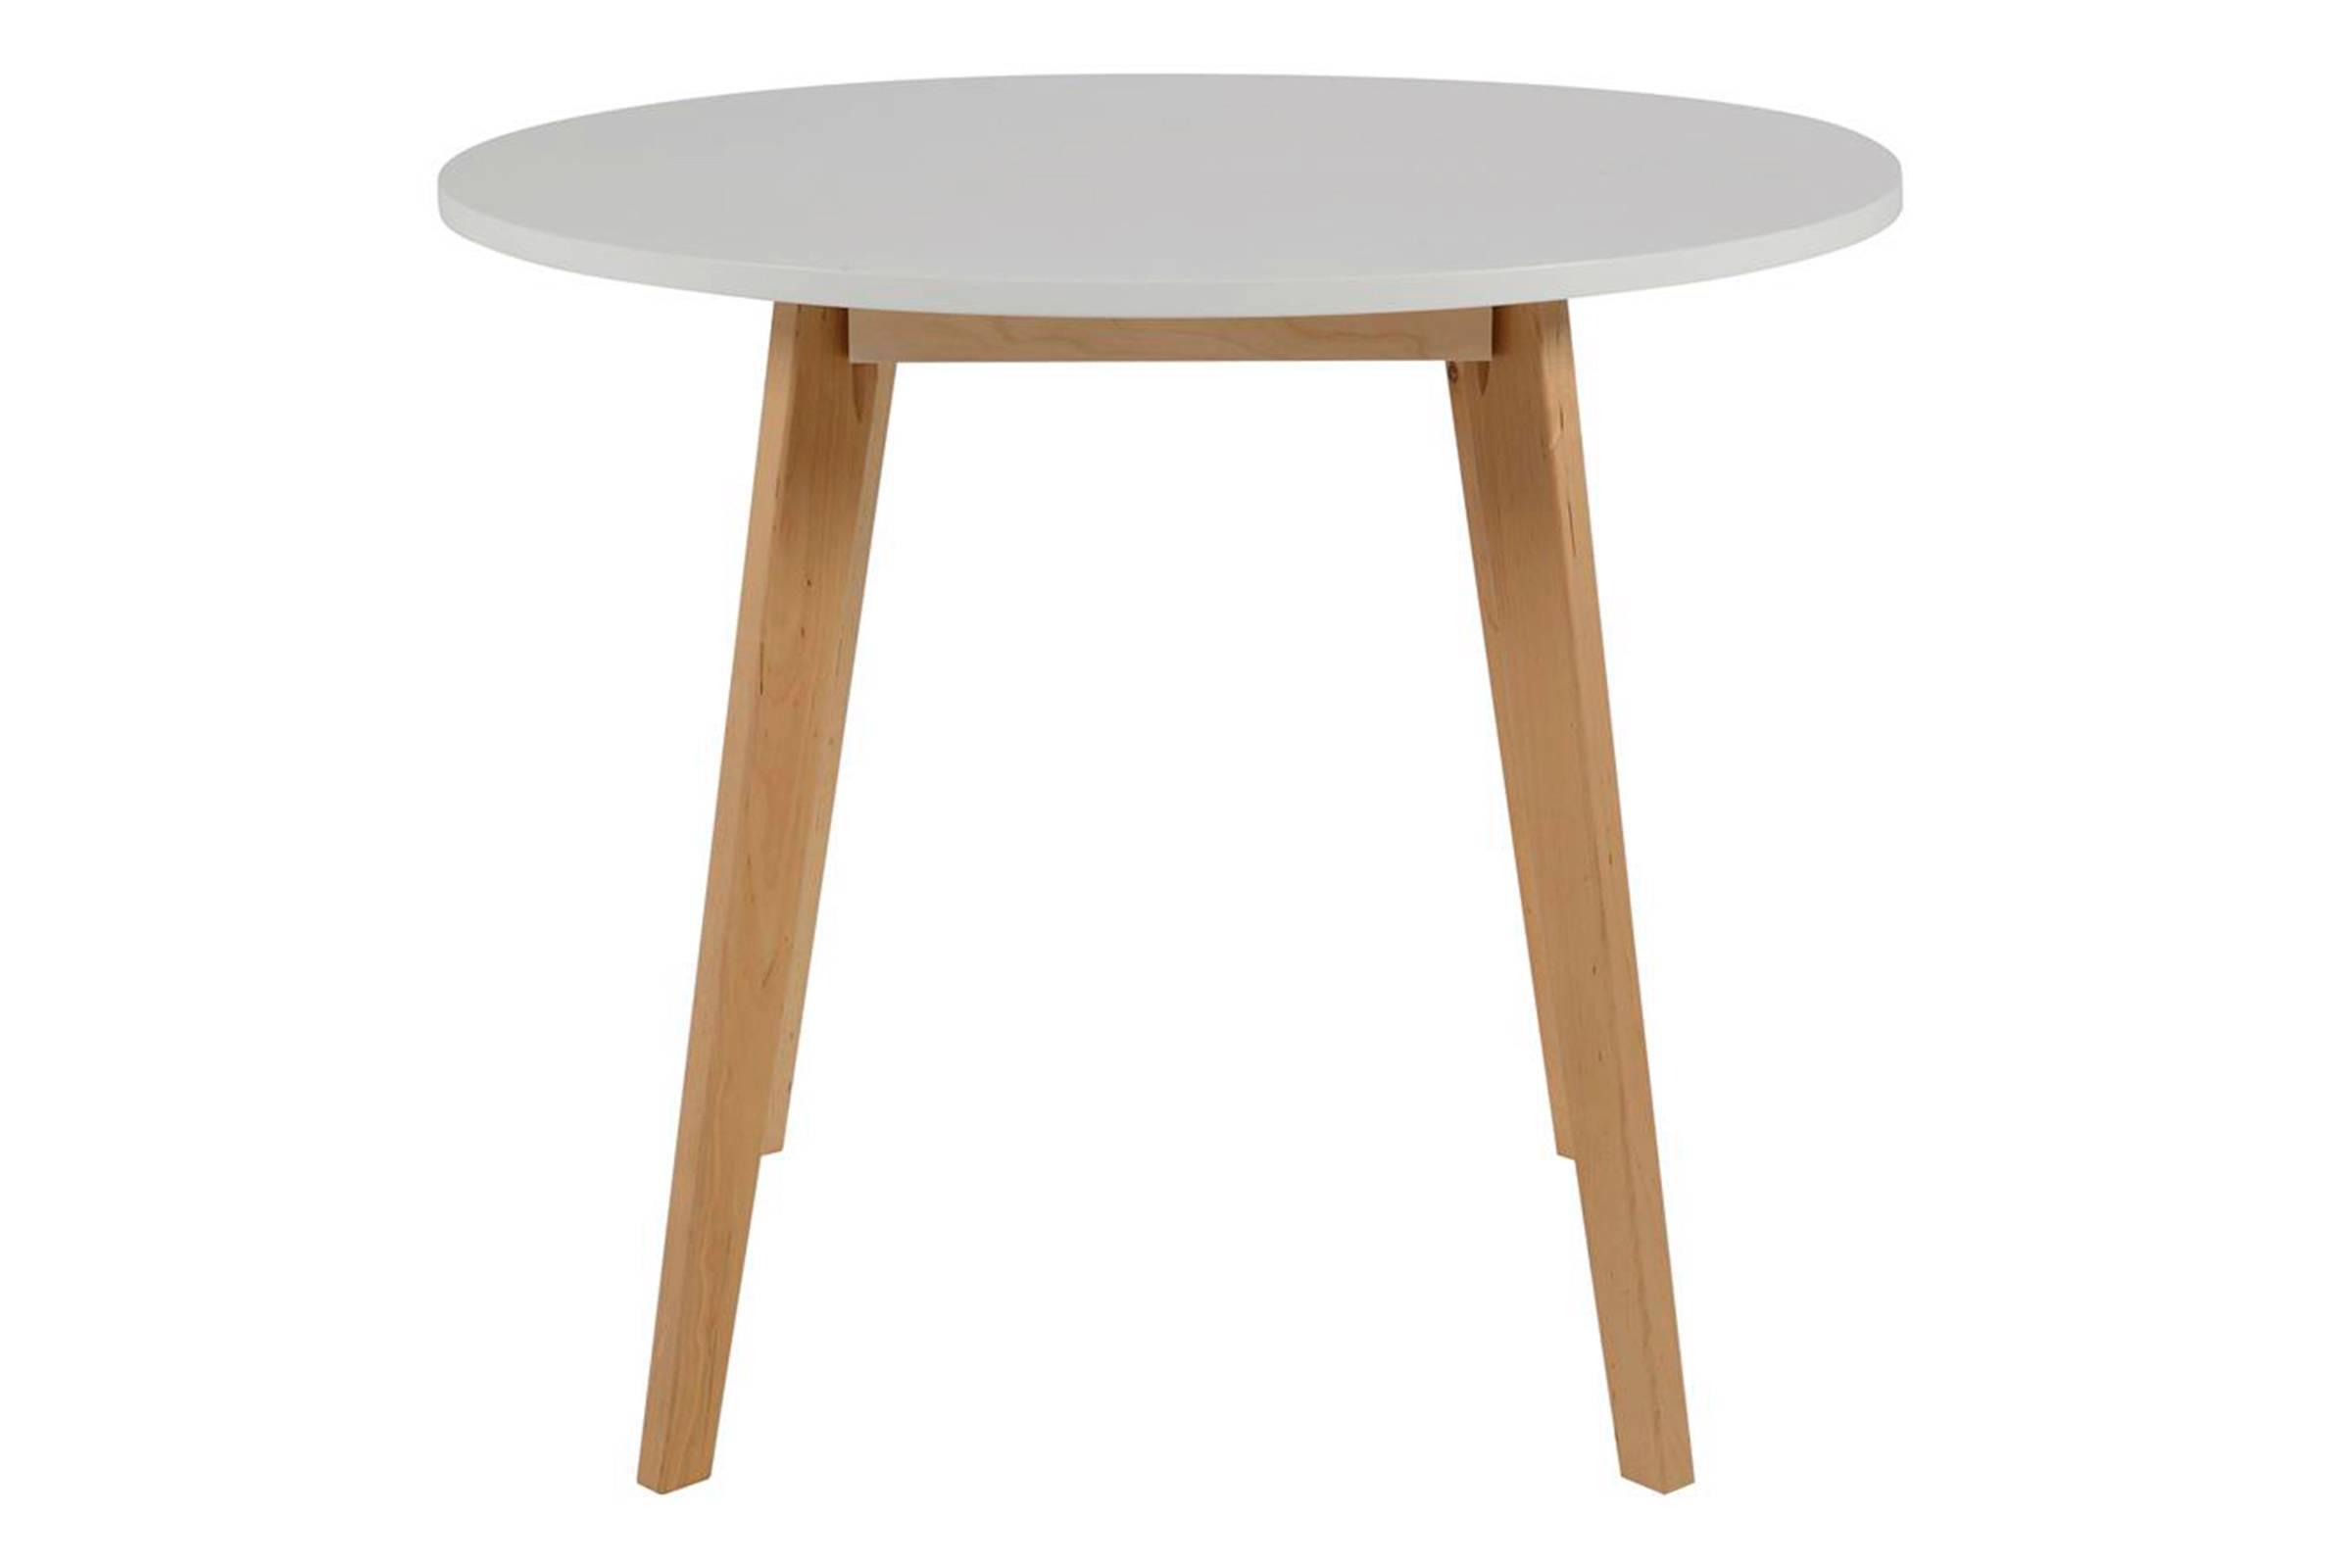 Sav Ø samt uitschuifbare tafel tokyoughoul re kousatu netabare